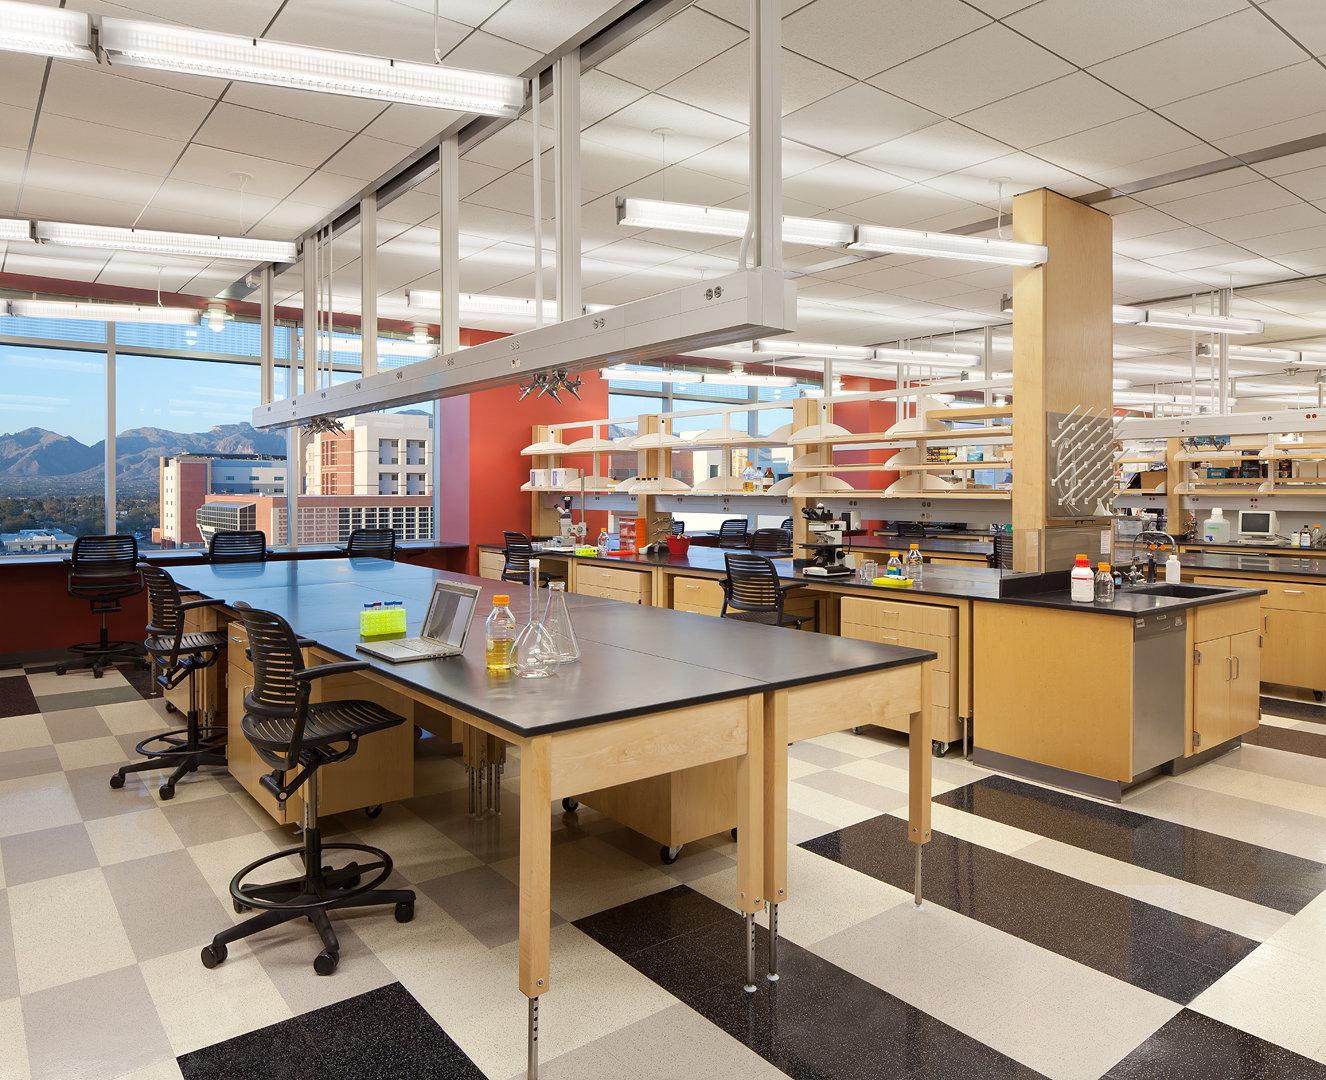 University of Arizona | Science Lab